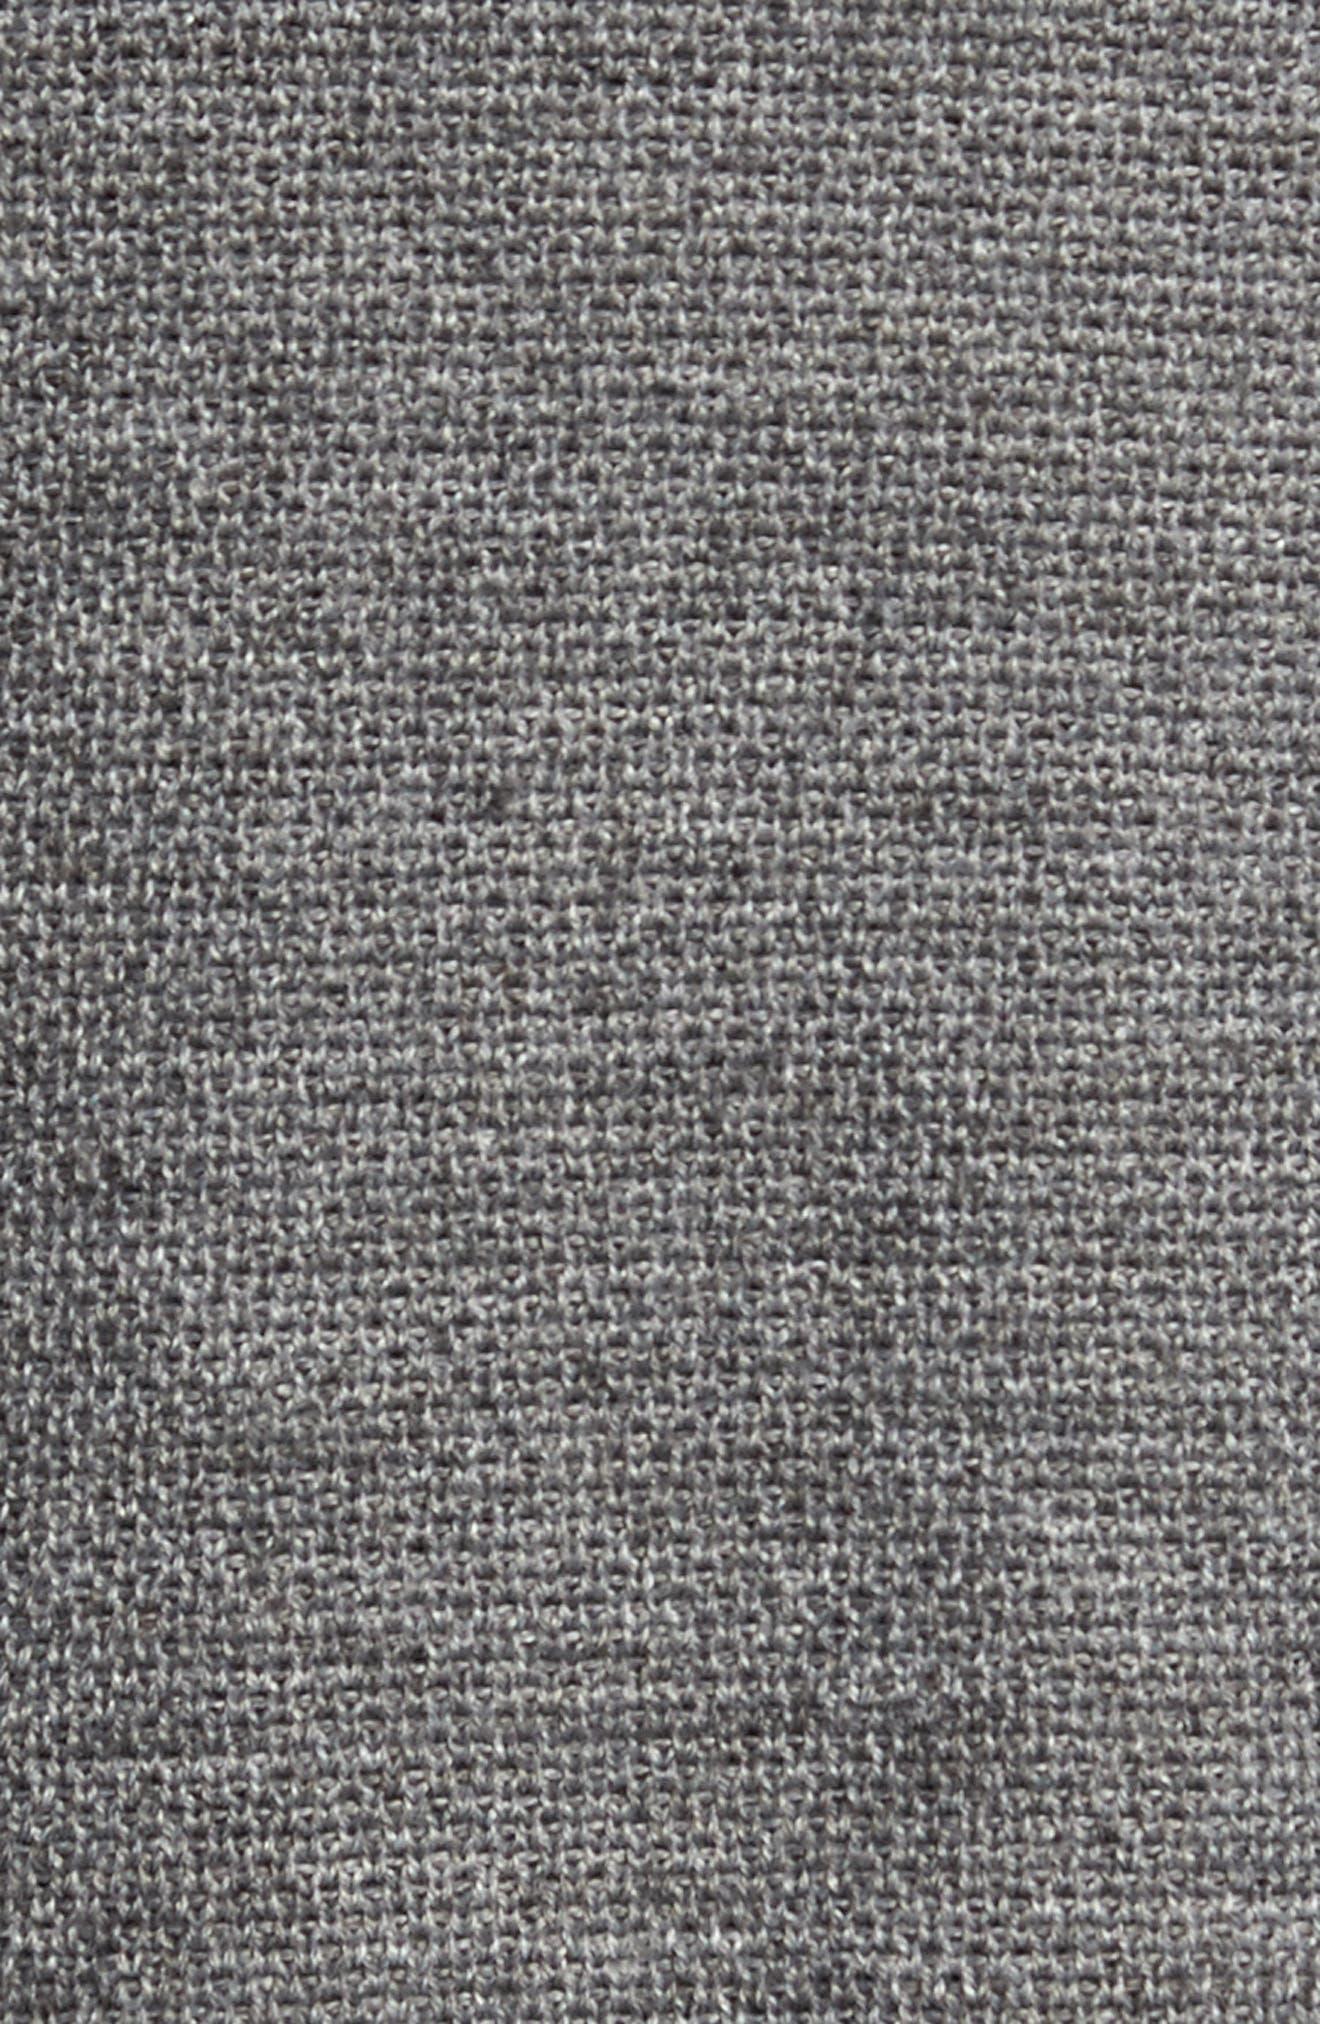 Honeycomb Zip Front Cardigan,                             Alternate thumbnail 5, color,                             030